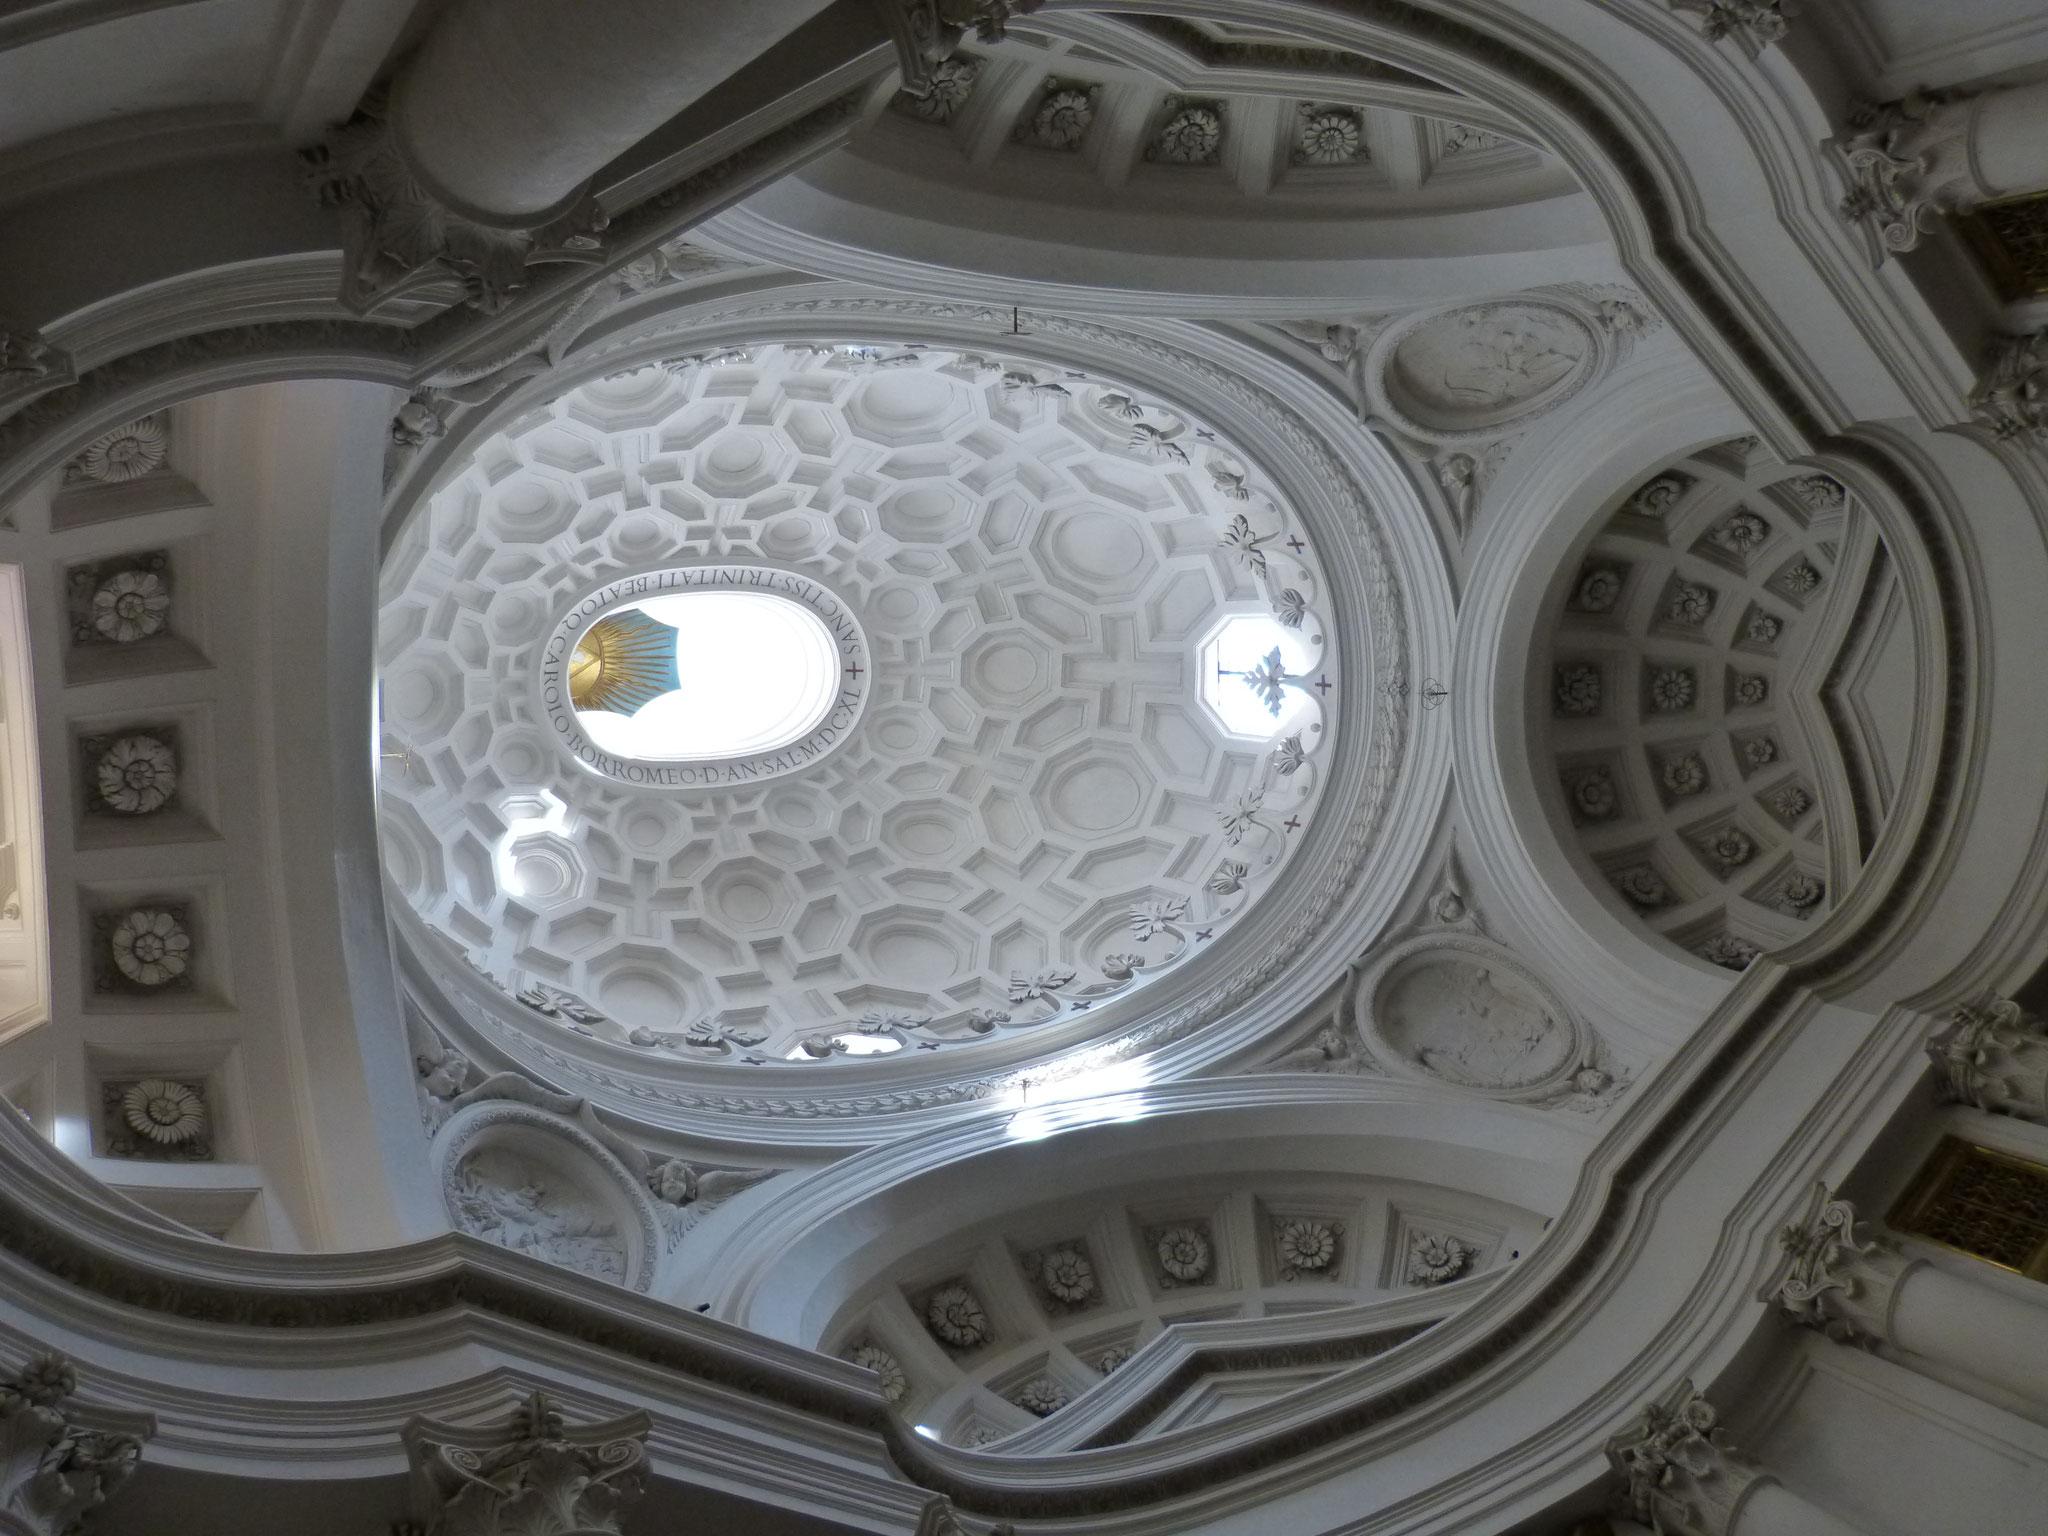 Sehenswerte Kuppel der Chiesa S. Carlino alle quattro Fontane